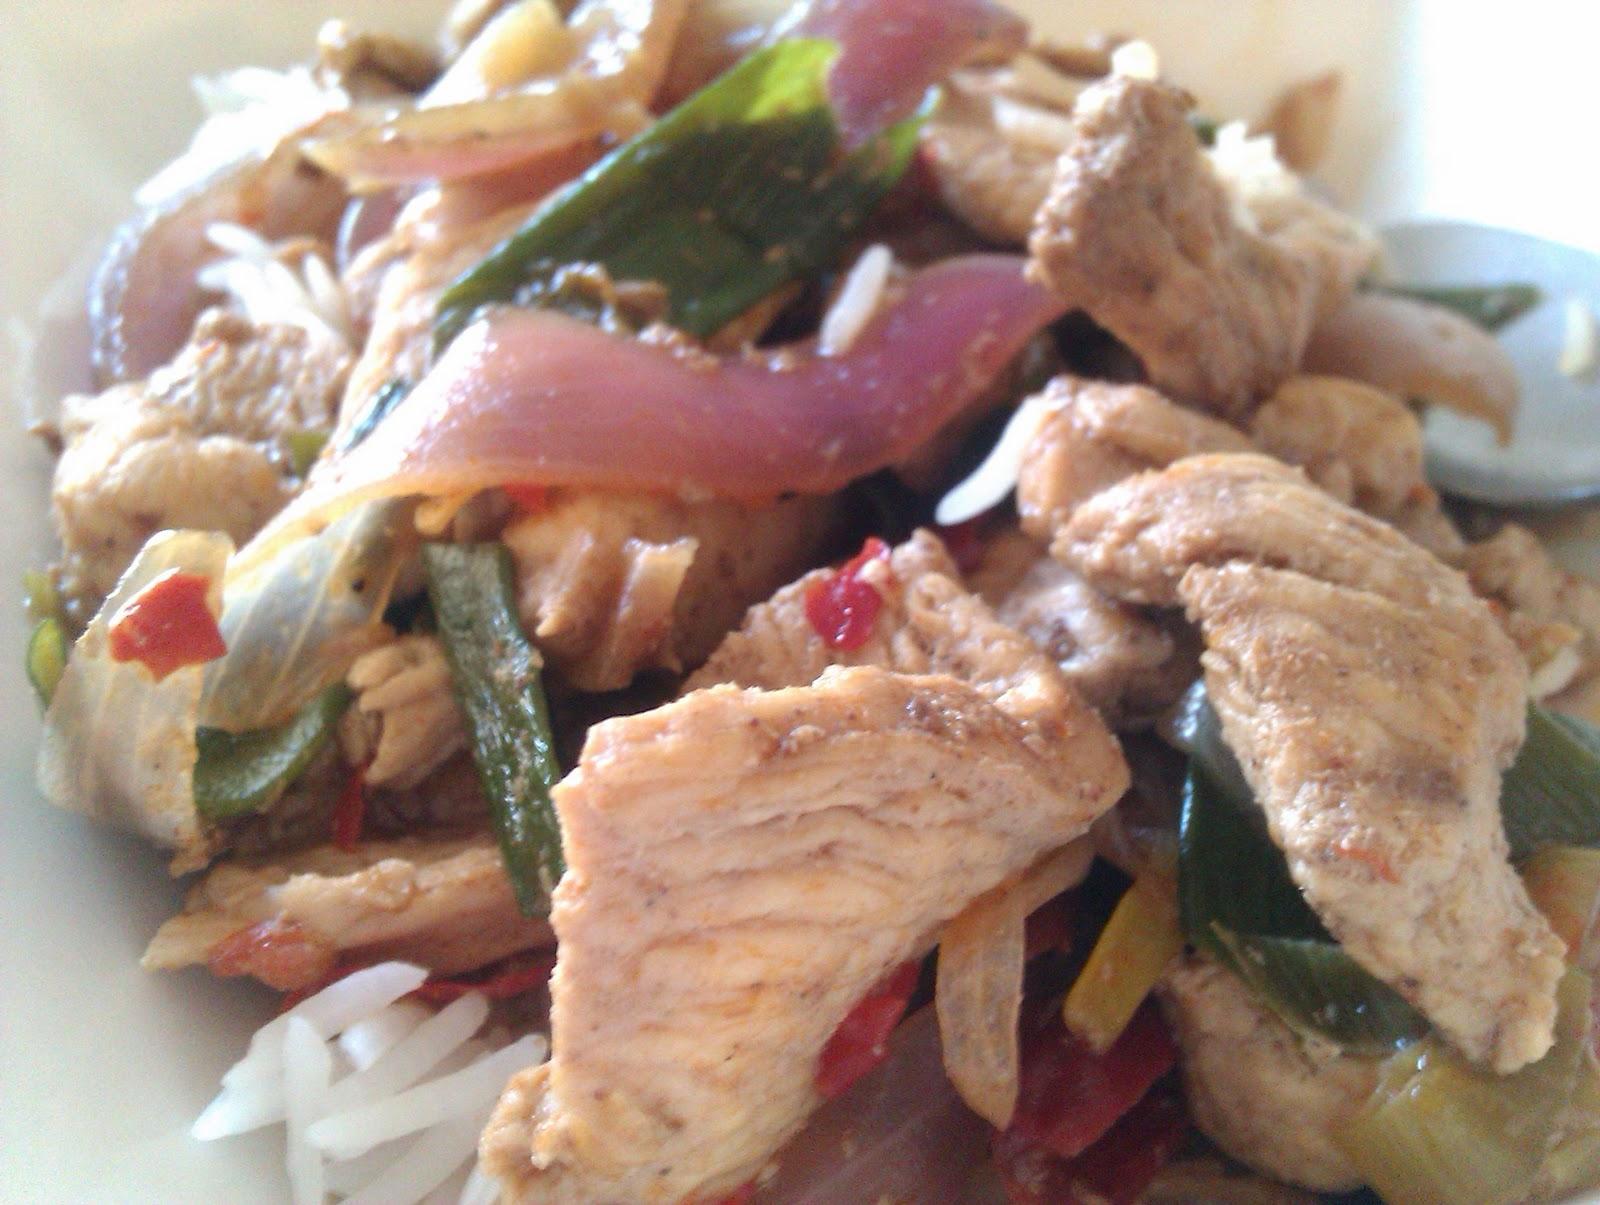 500g chicken, cut into thin strips